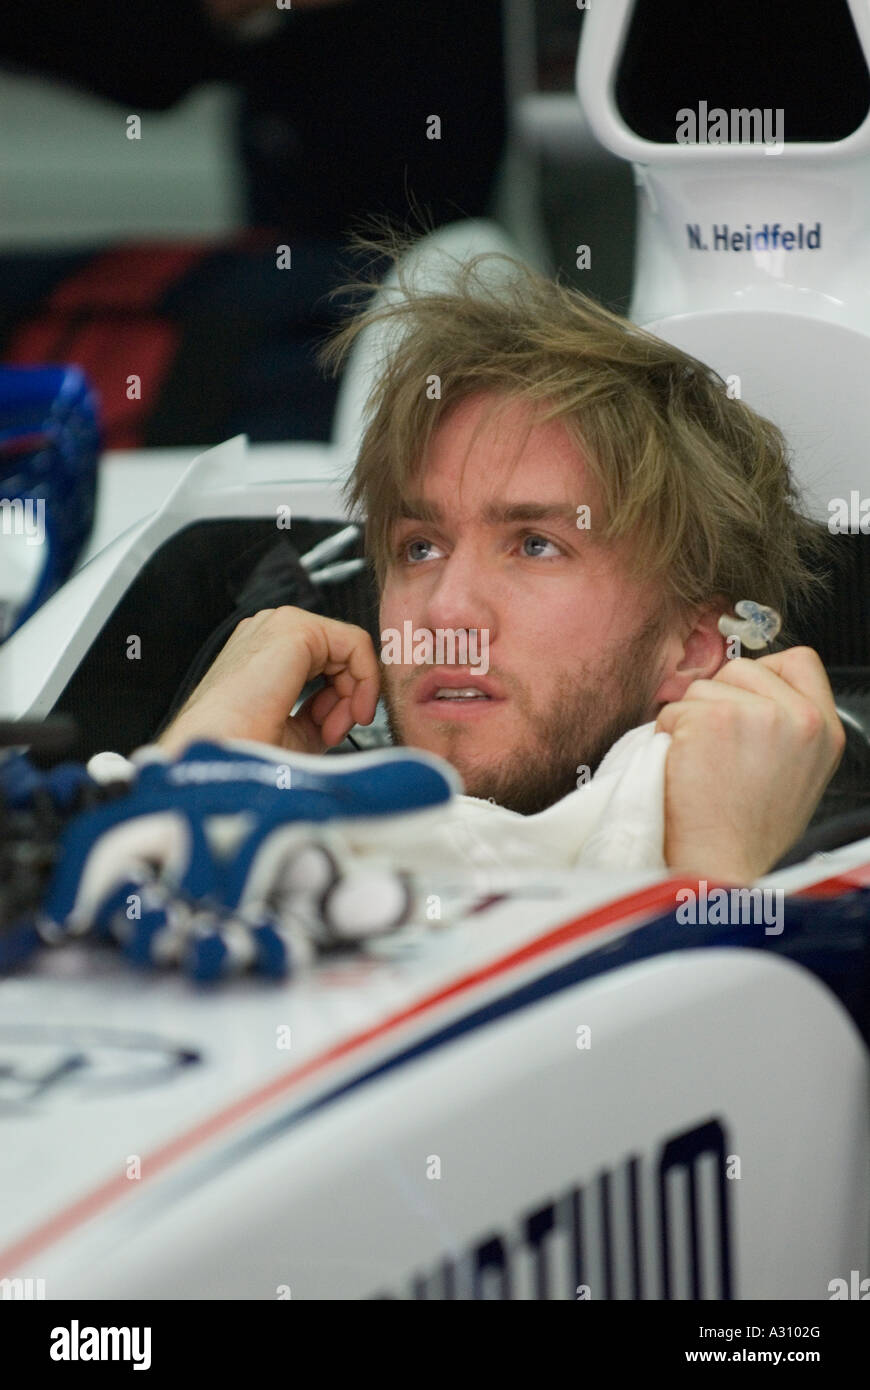 German Valencia It U B German Valencia German Formula Driver  # Muebles Kostic Palencia